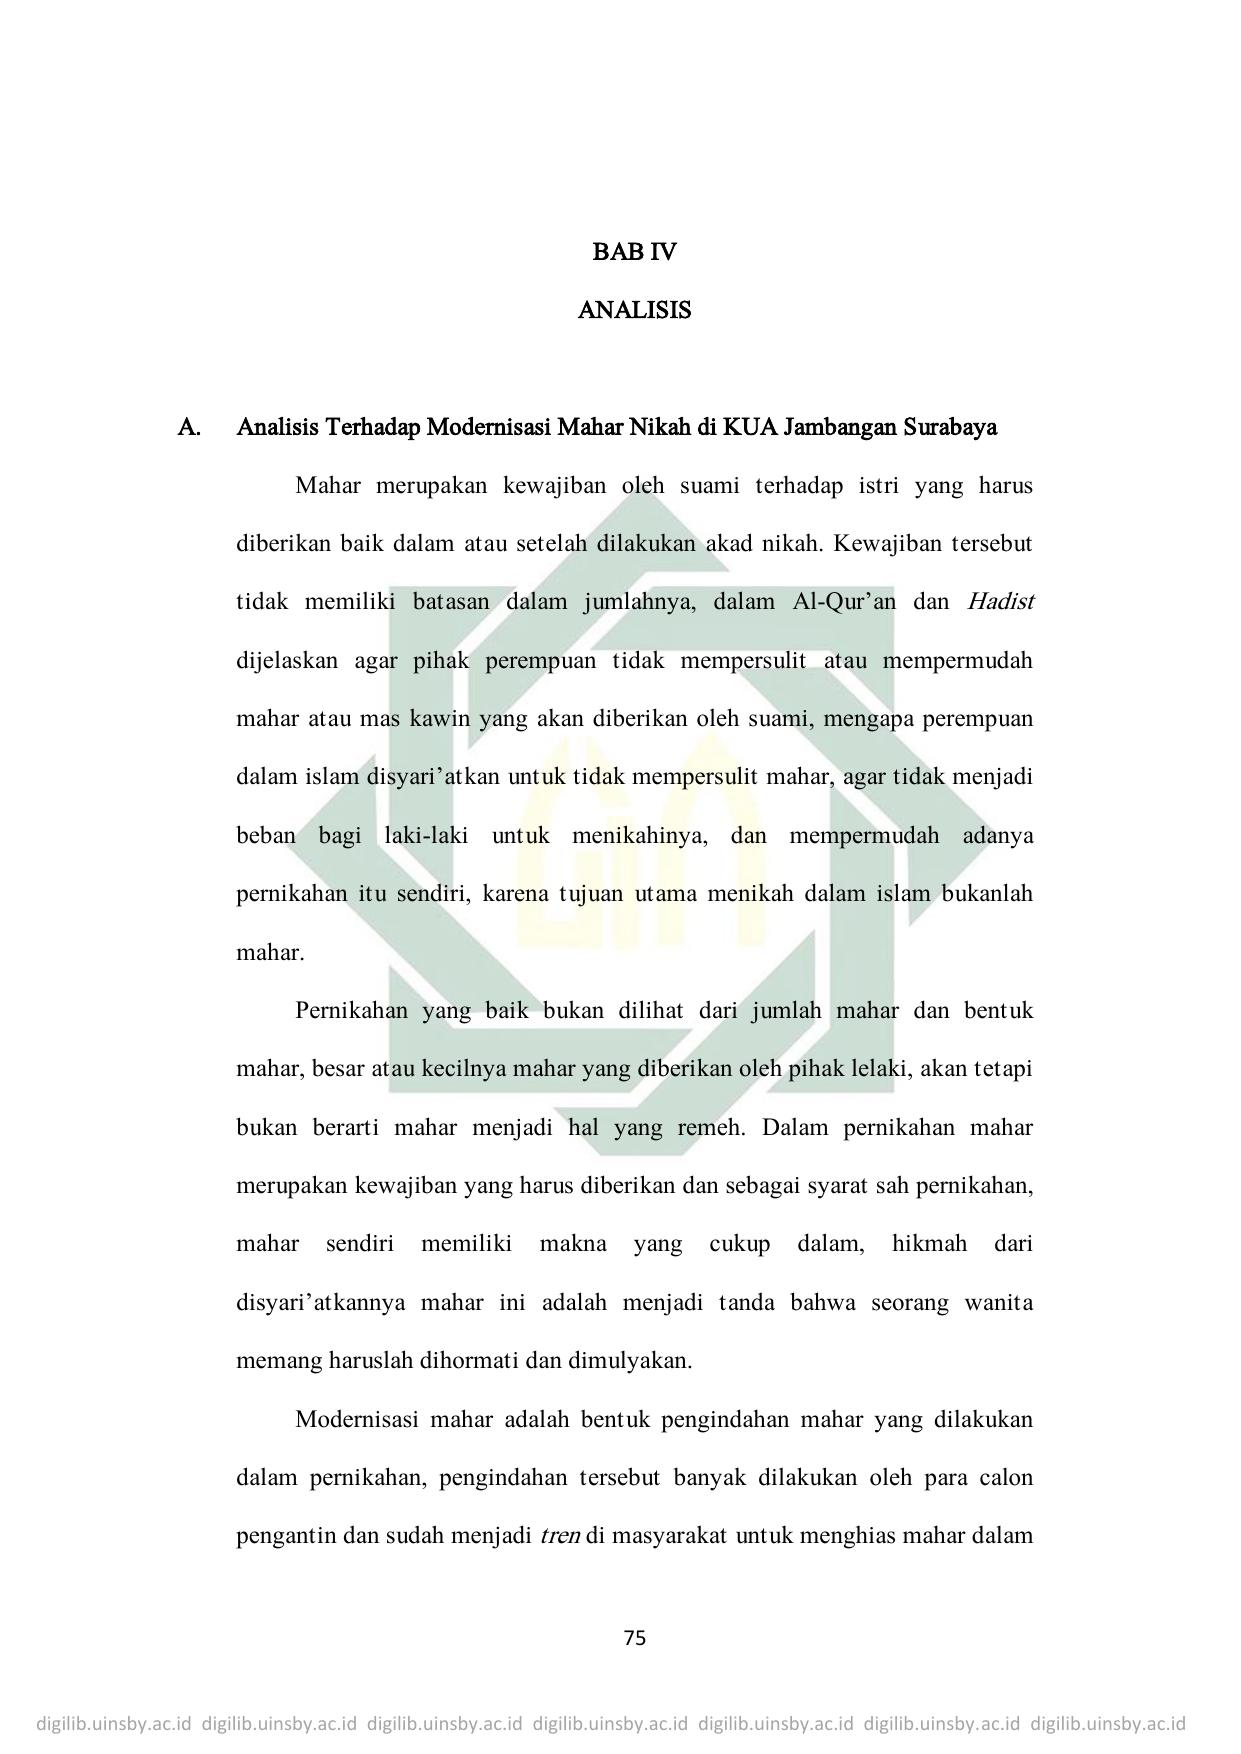 BAB IV ANALISIS A. Analisis Terhadap Modernisasi Mahar Nikah di 8ccd4eb9cf